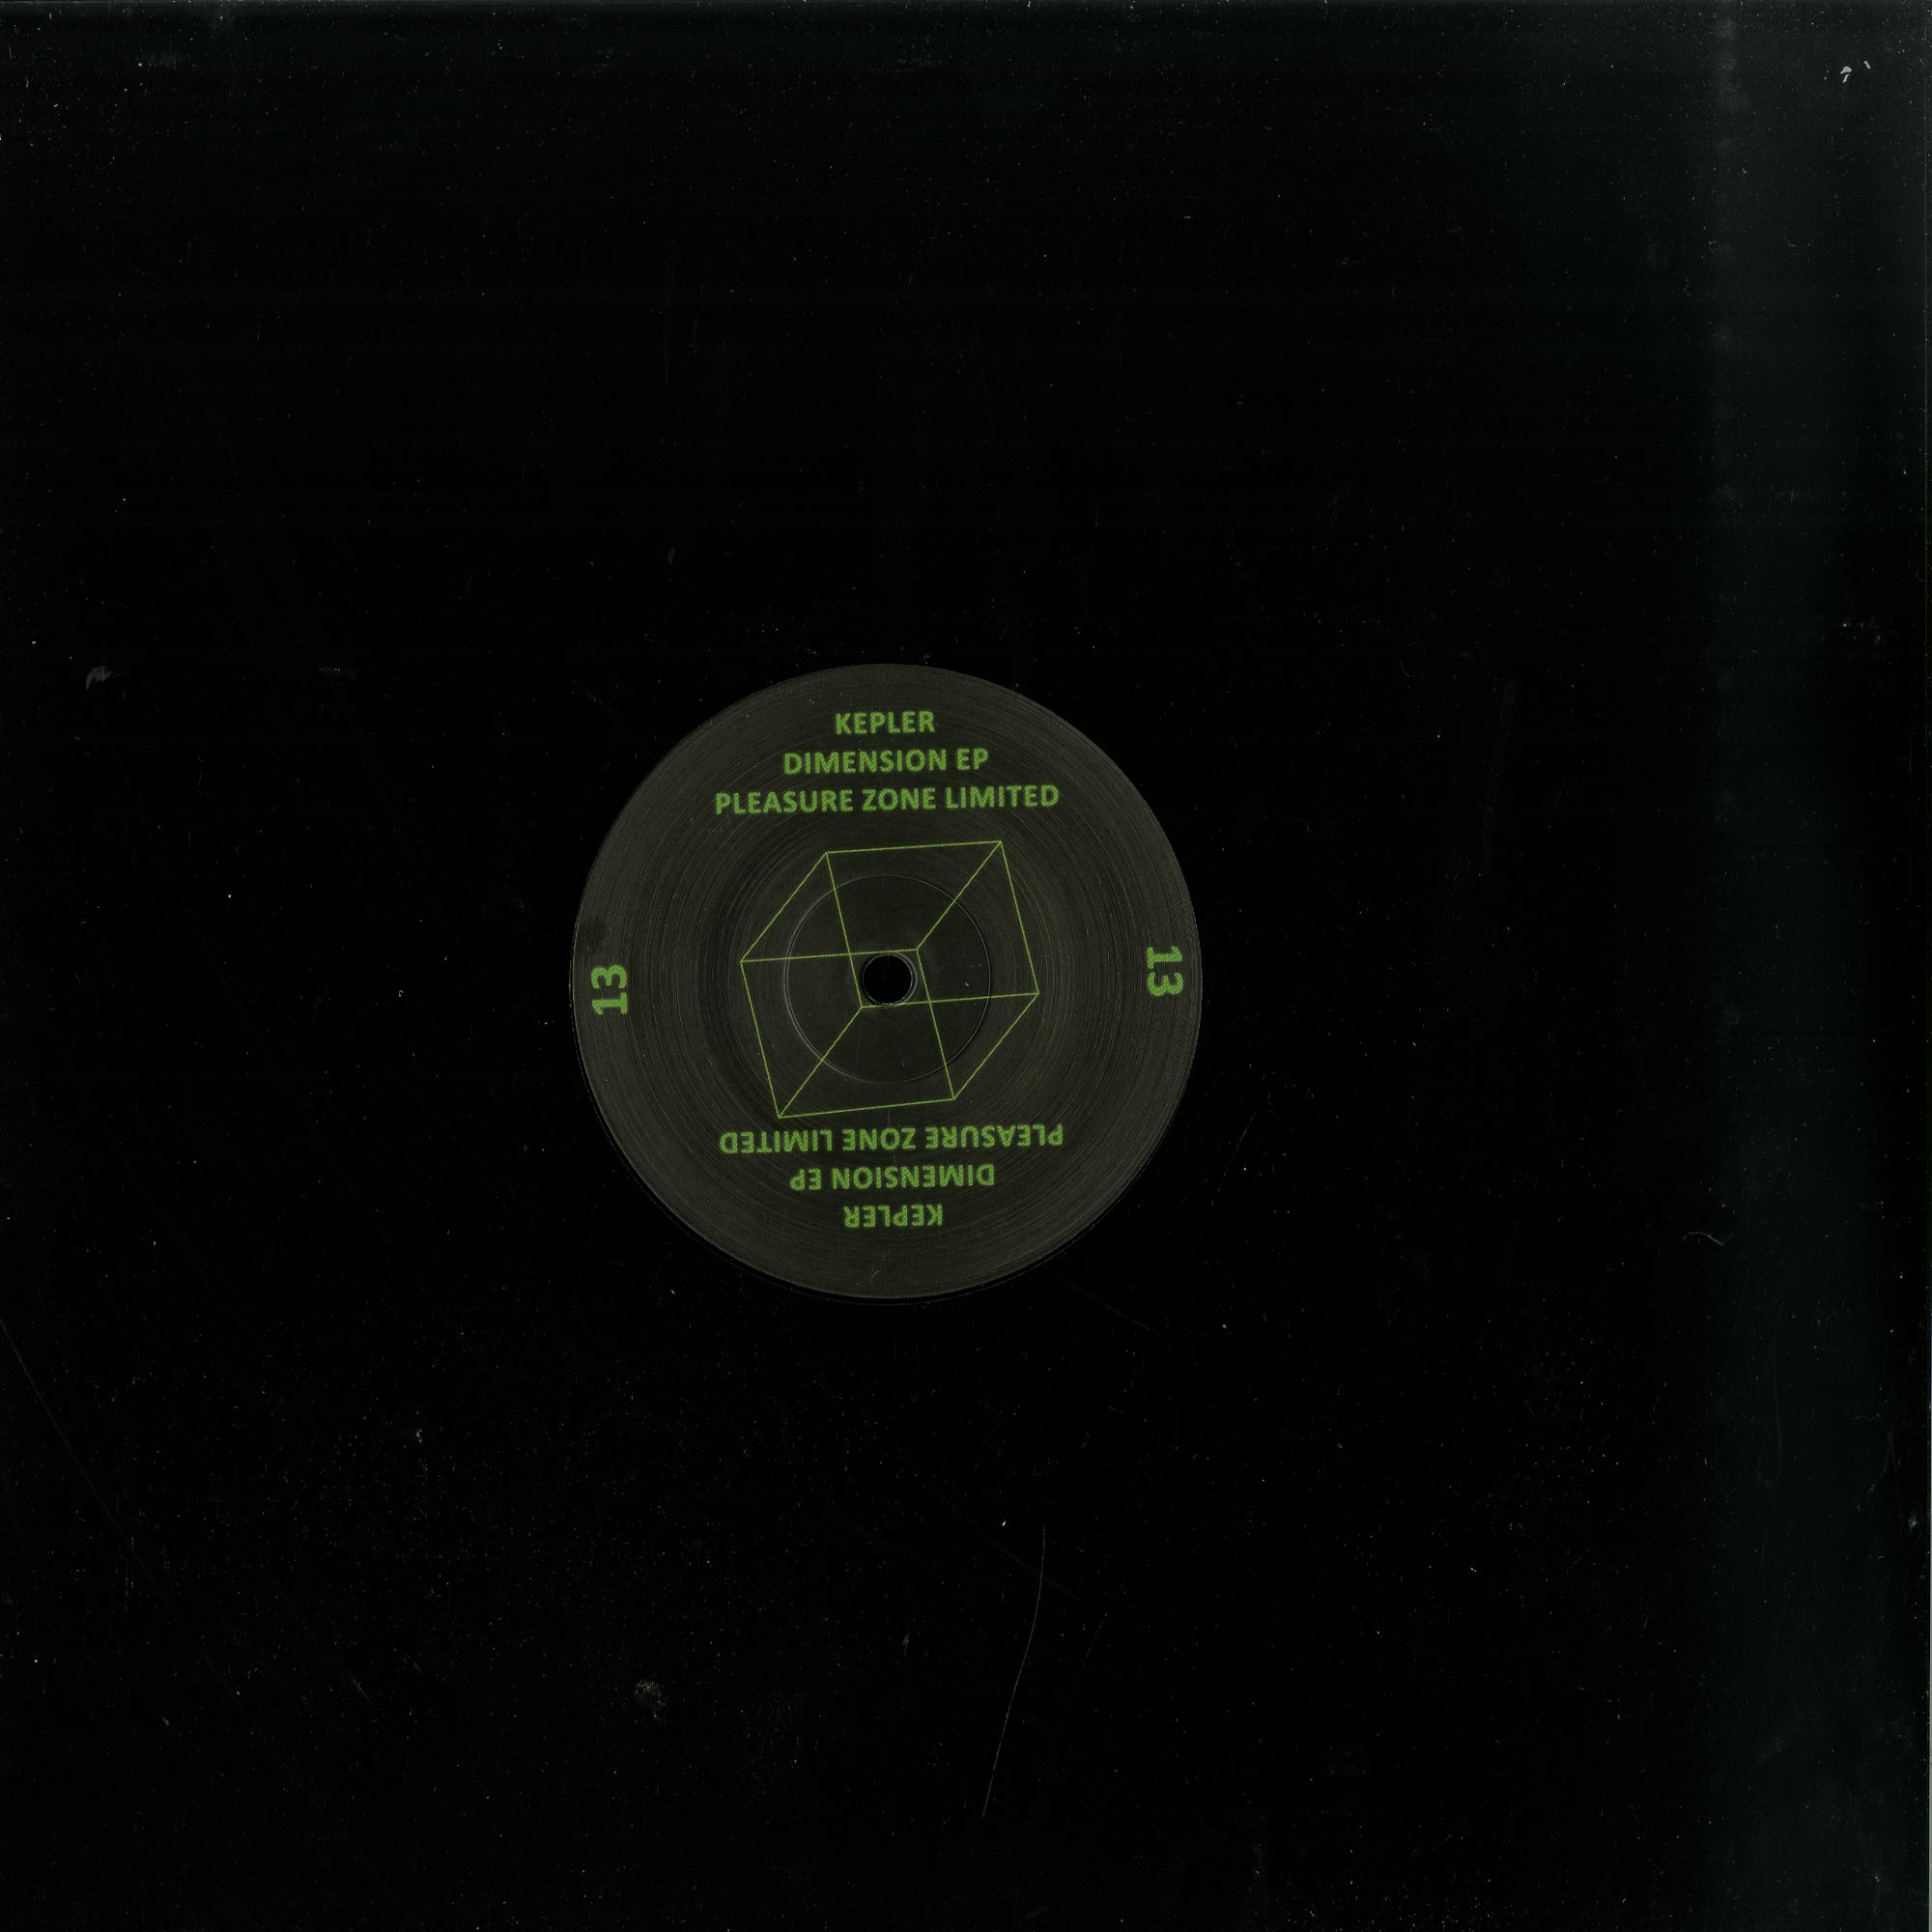 Kepler - DIMENSION EP